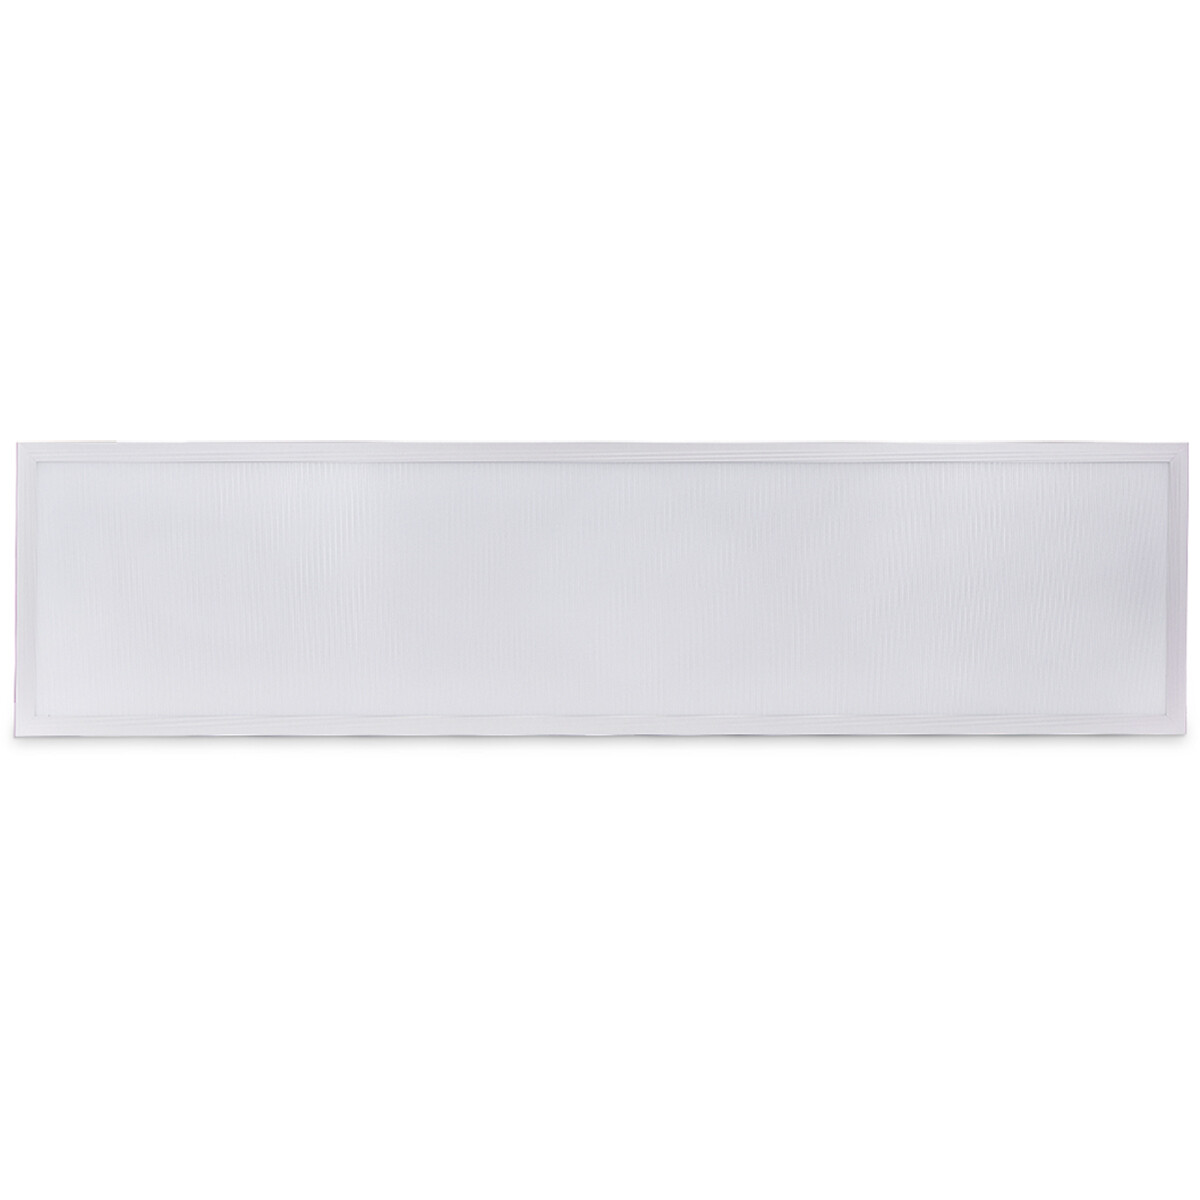 LED Paneel - Aigi Hyron - 30x120 - Aanpasbare Kleur CCT - 32W - Inbouw - Vierkant - Mat Wit - Aluminium - Flikkervrij